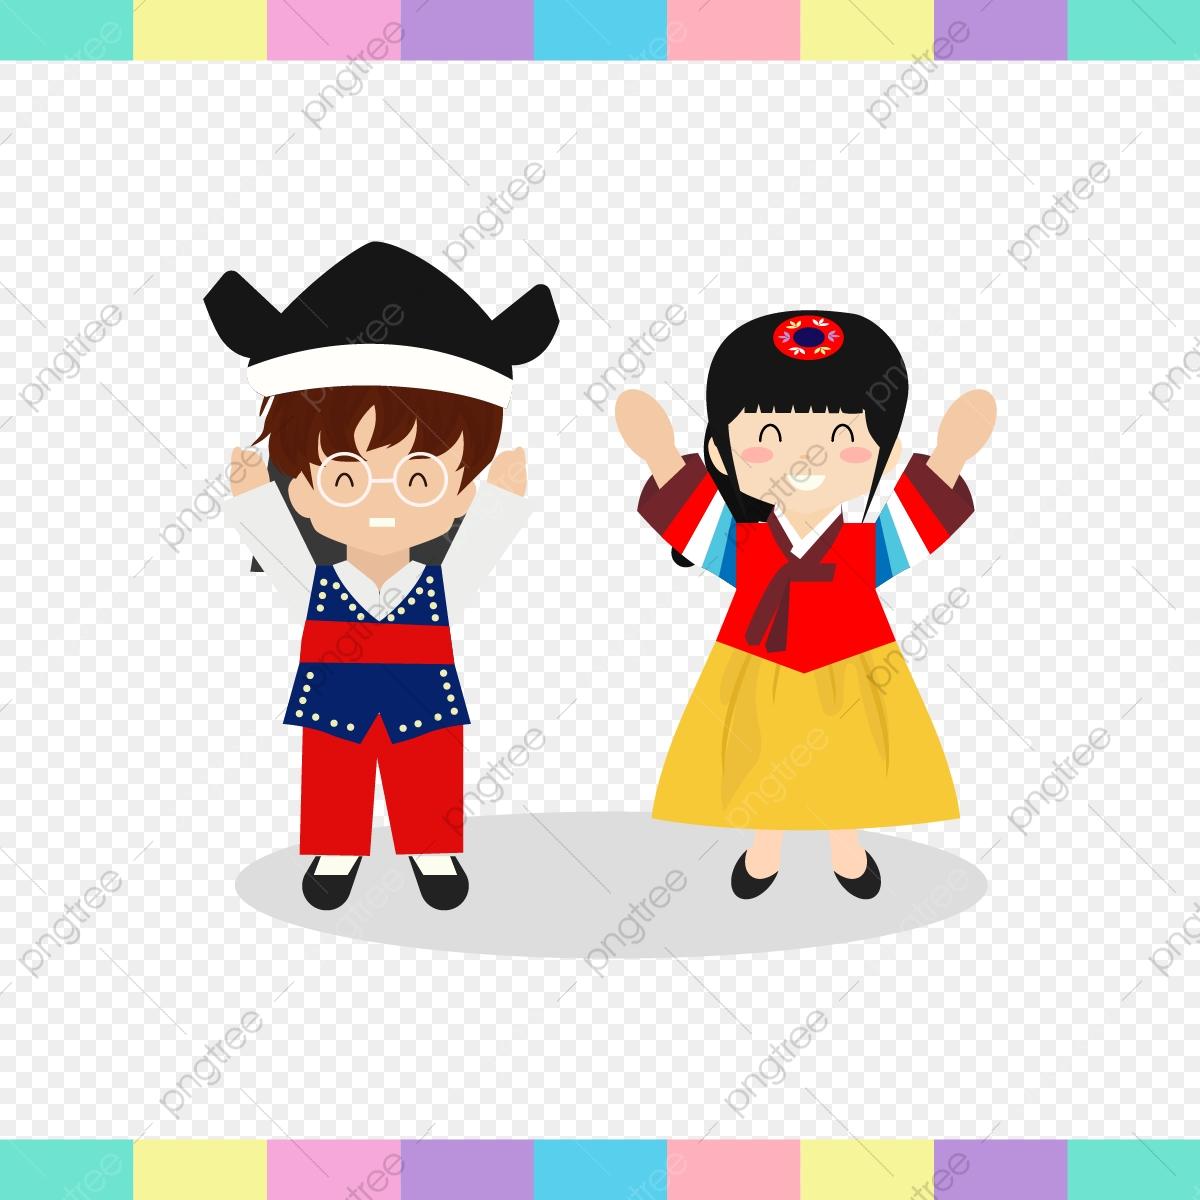 Kids happy chuseok day. Couple clipart celebration